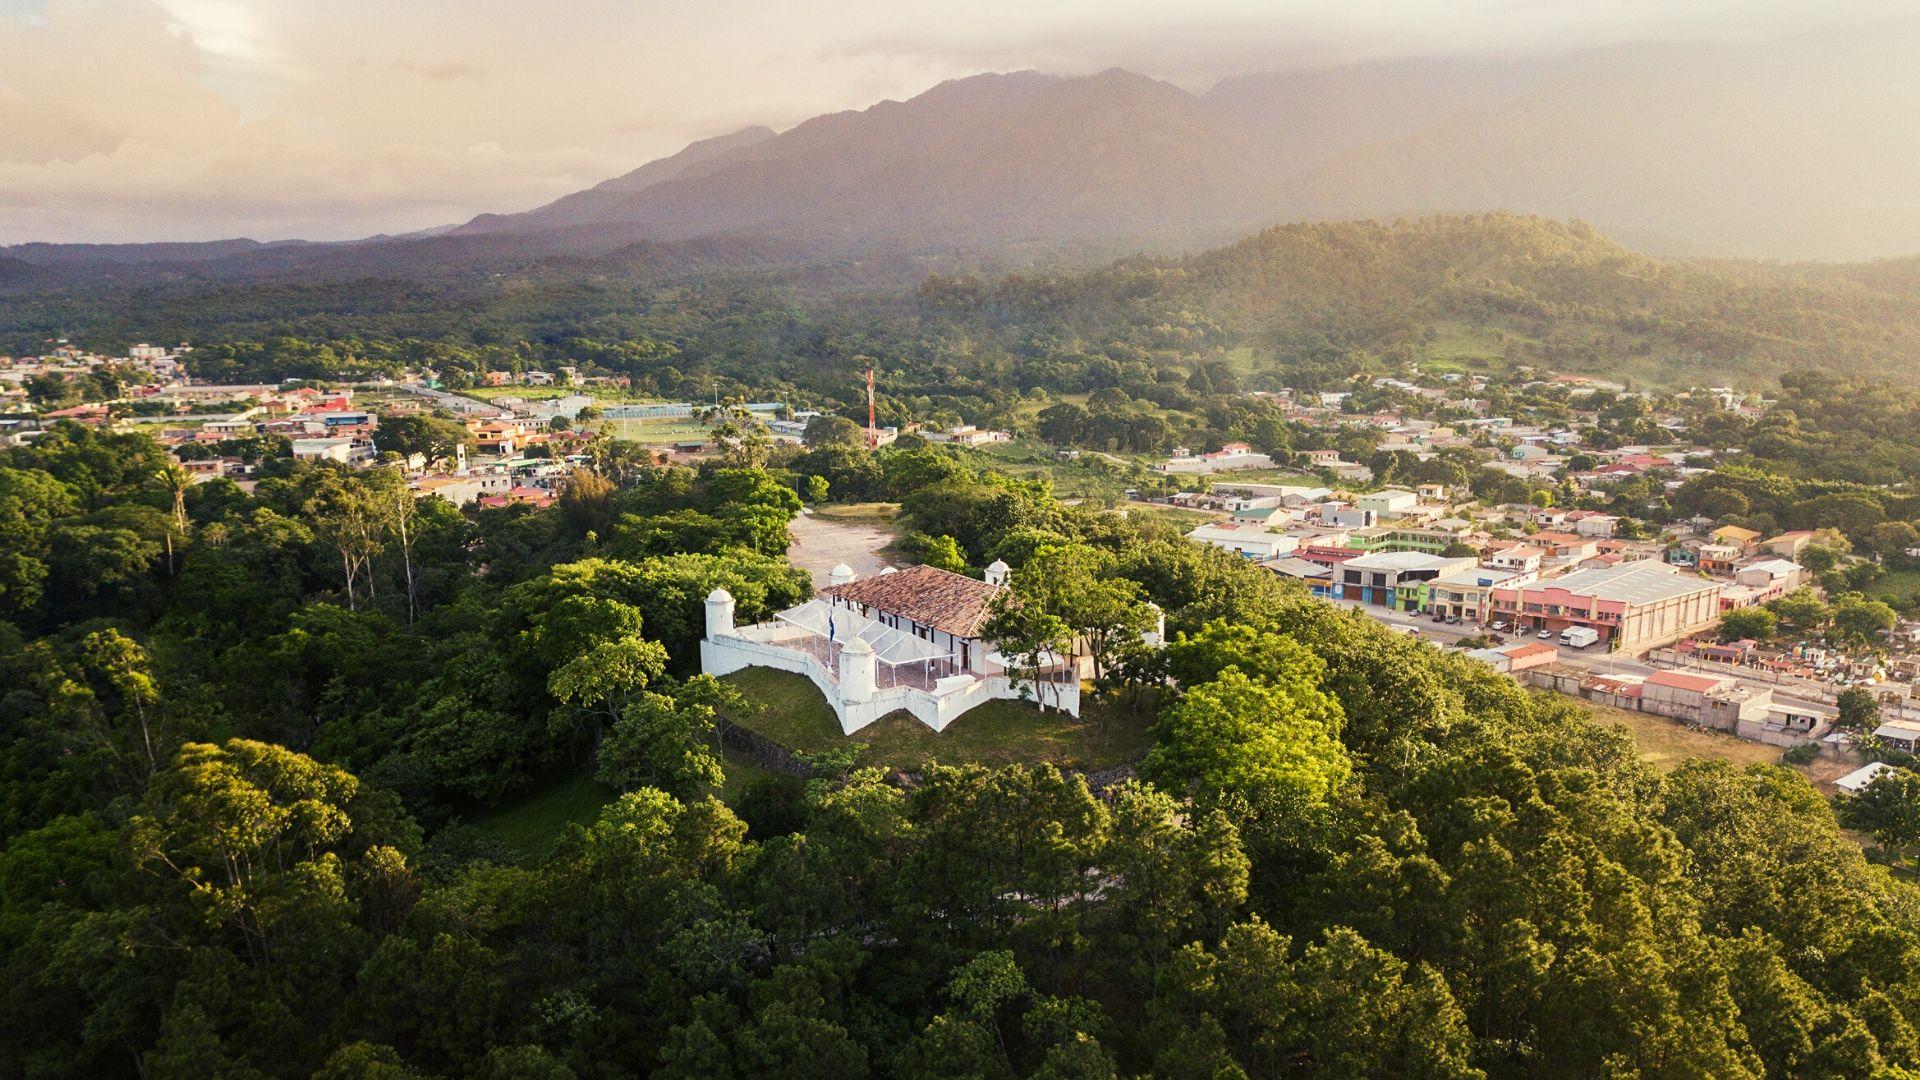 Fuerte de San Cristóbal, la antigua Capital de Nueva España